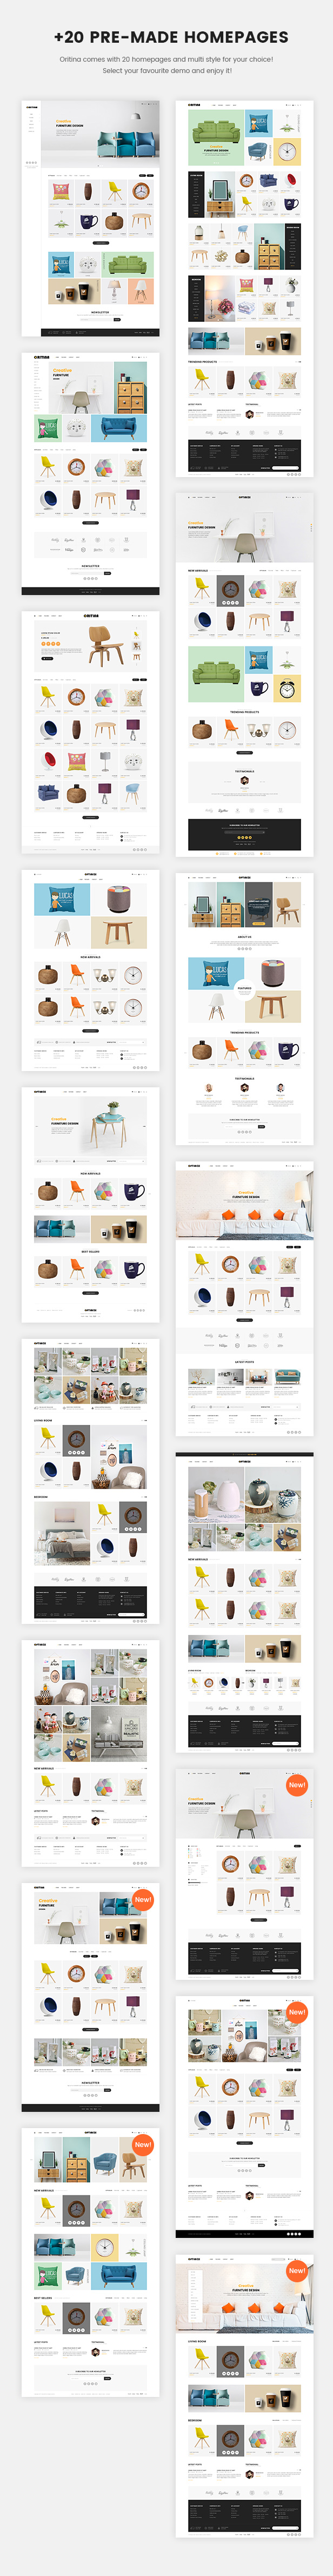 Oritina - Minimal WooCommerce Theme For Furniture, Decor, Interior | Prosyscom Tech 2